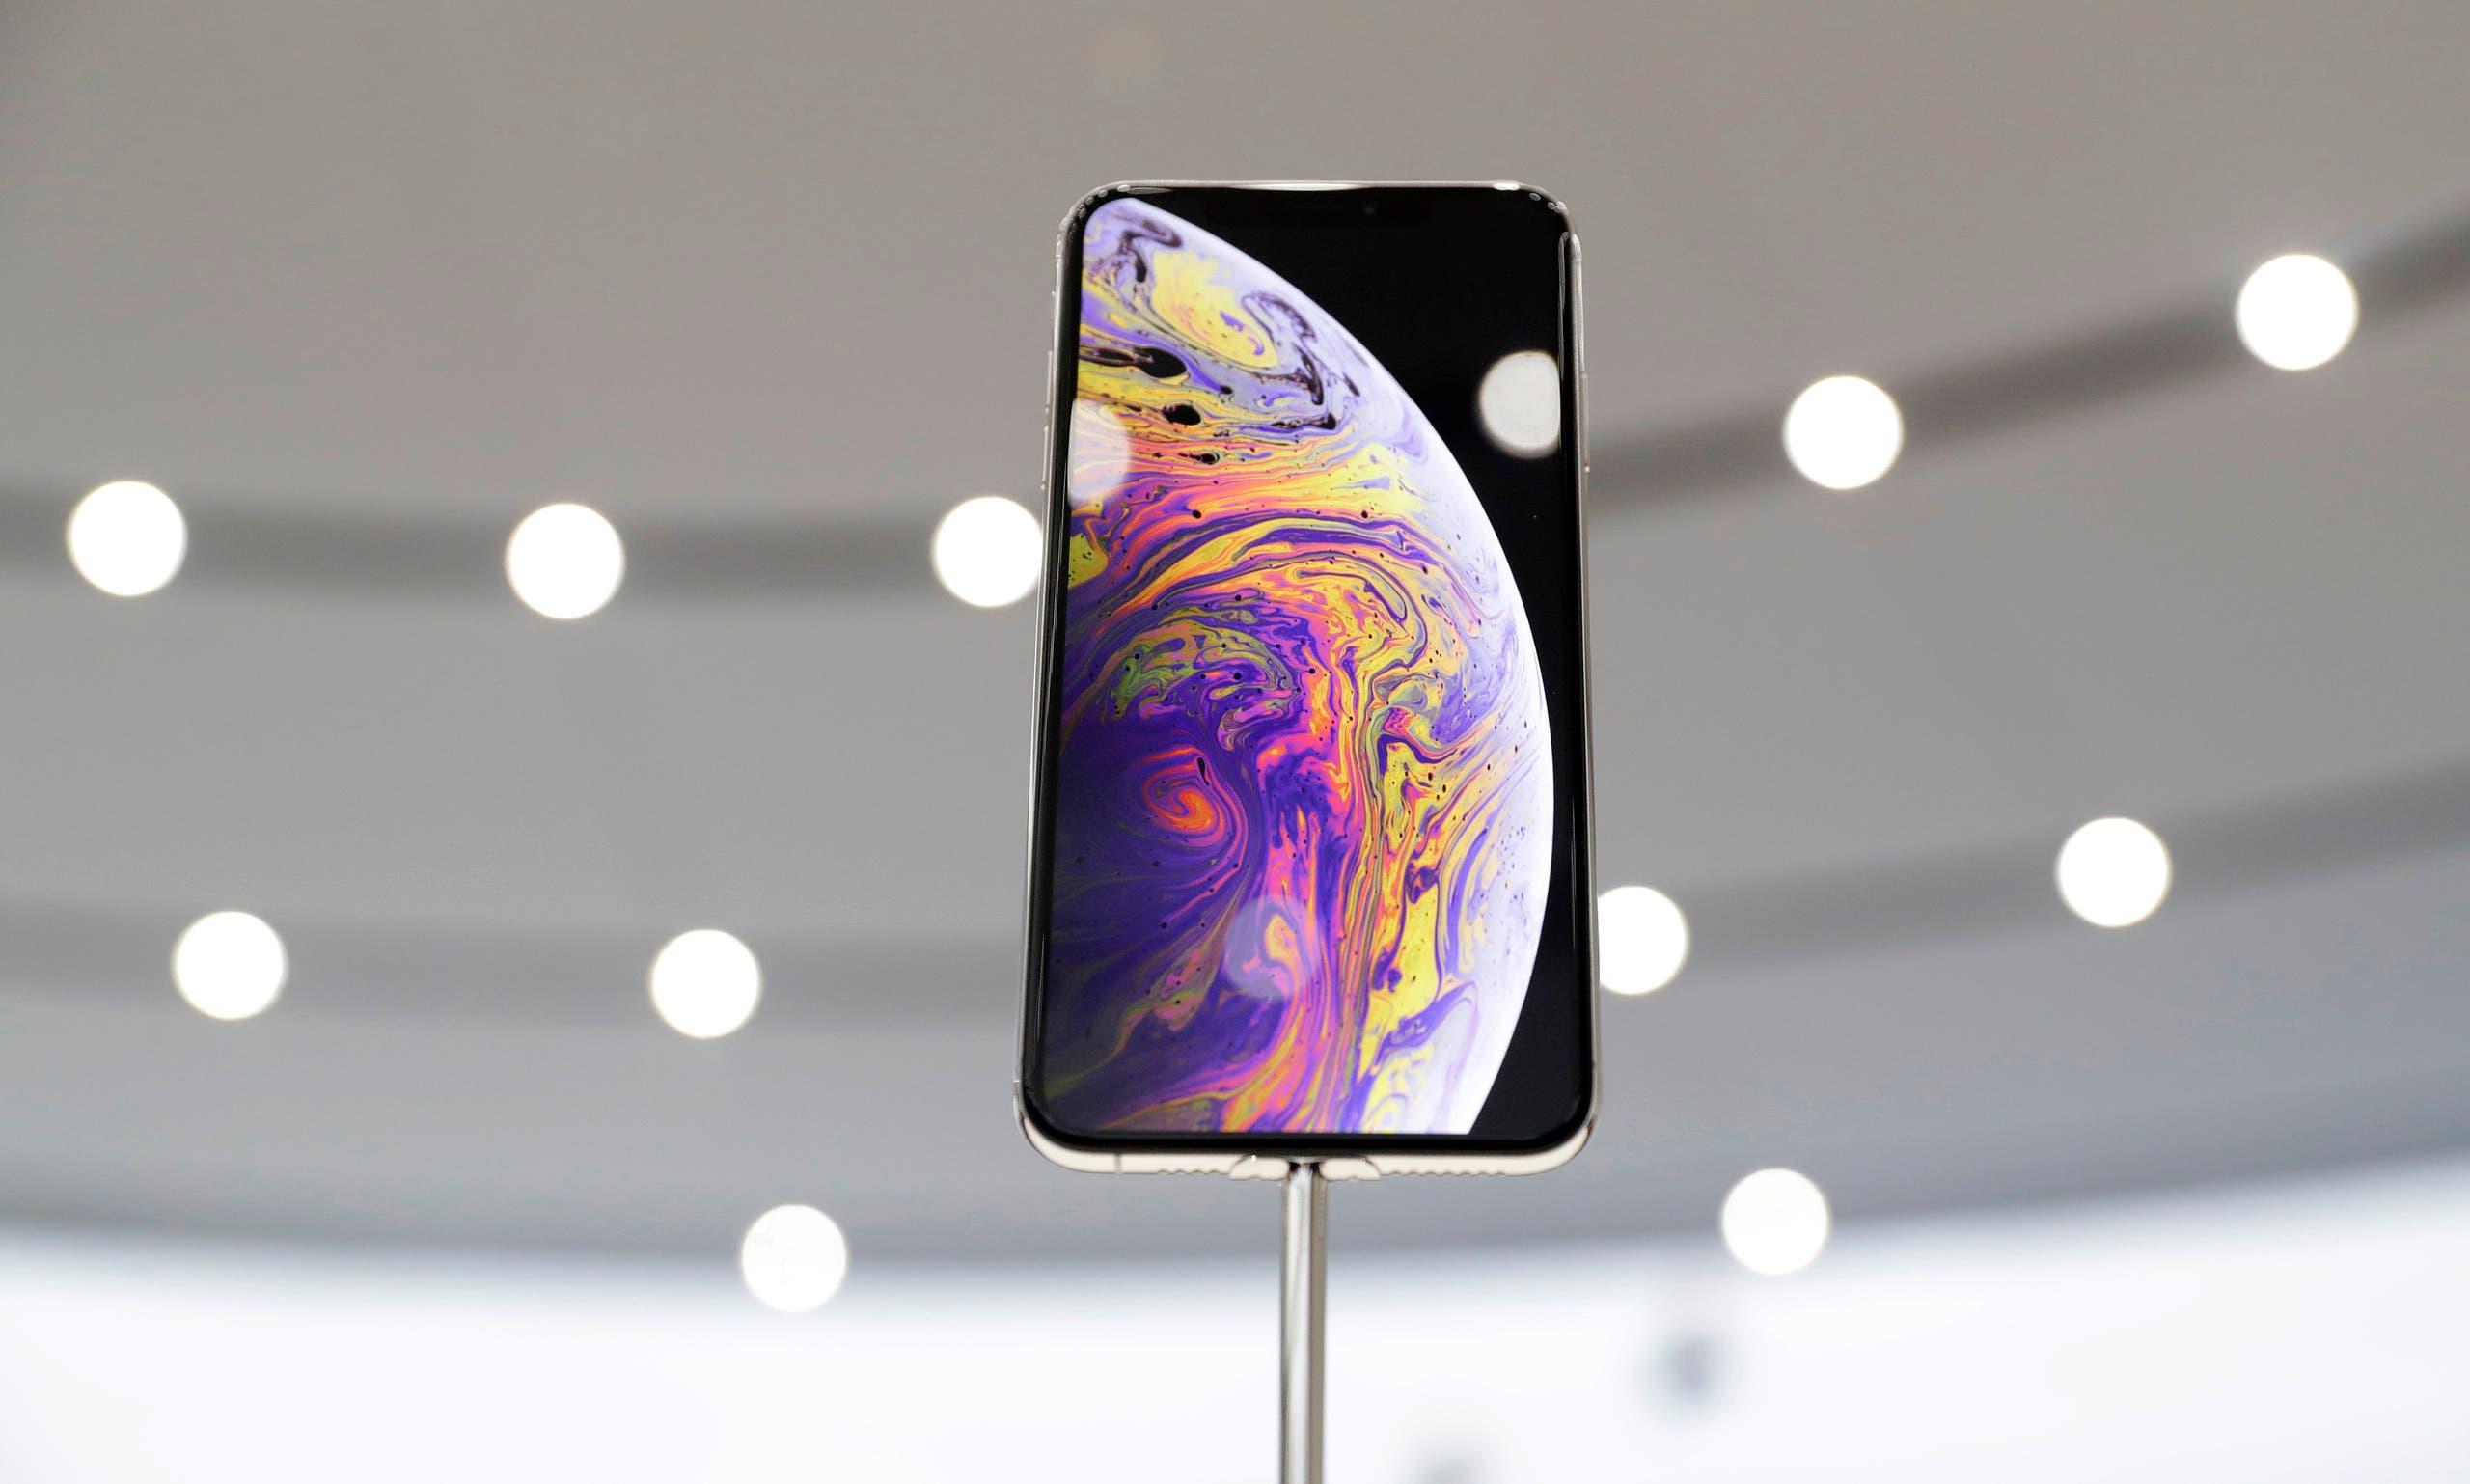 395a6aa3 824a 43eb 83ac e2993ae66328 سعر ومواصفات هواتف ايفون الجديدة،XSg ,Xmaxg ,Xr